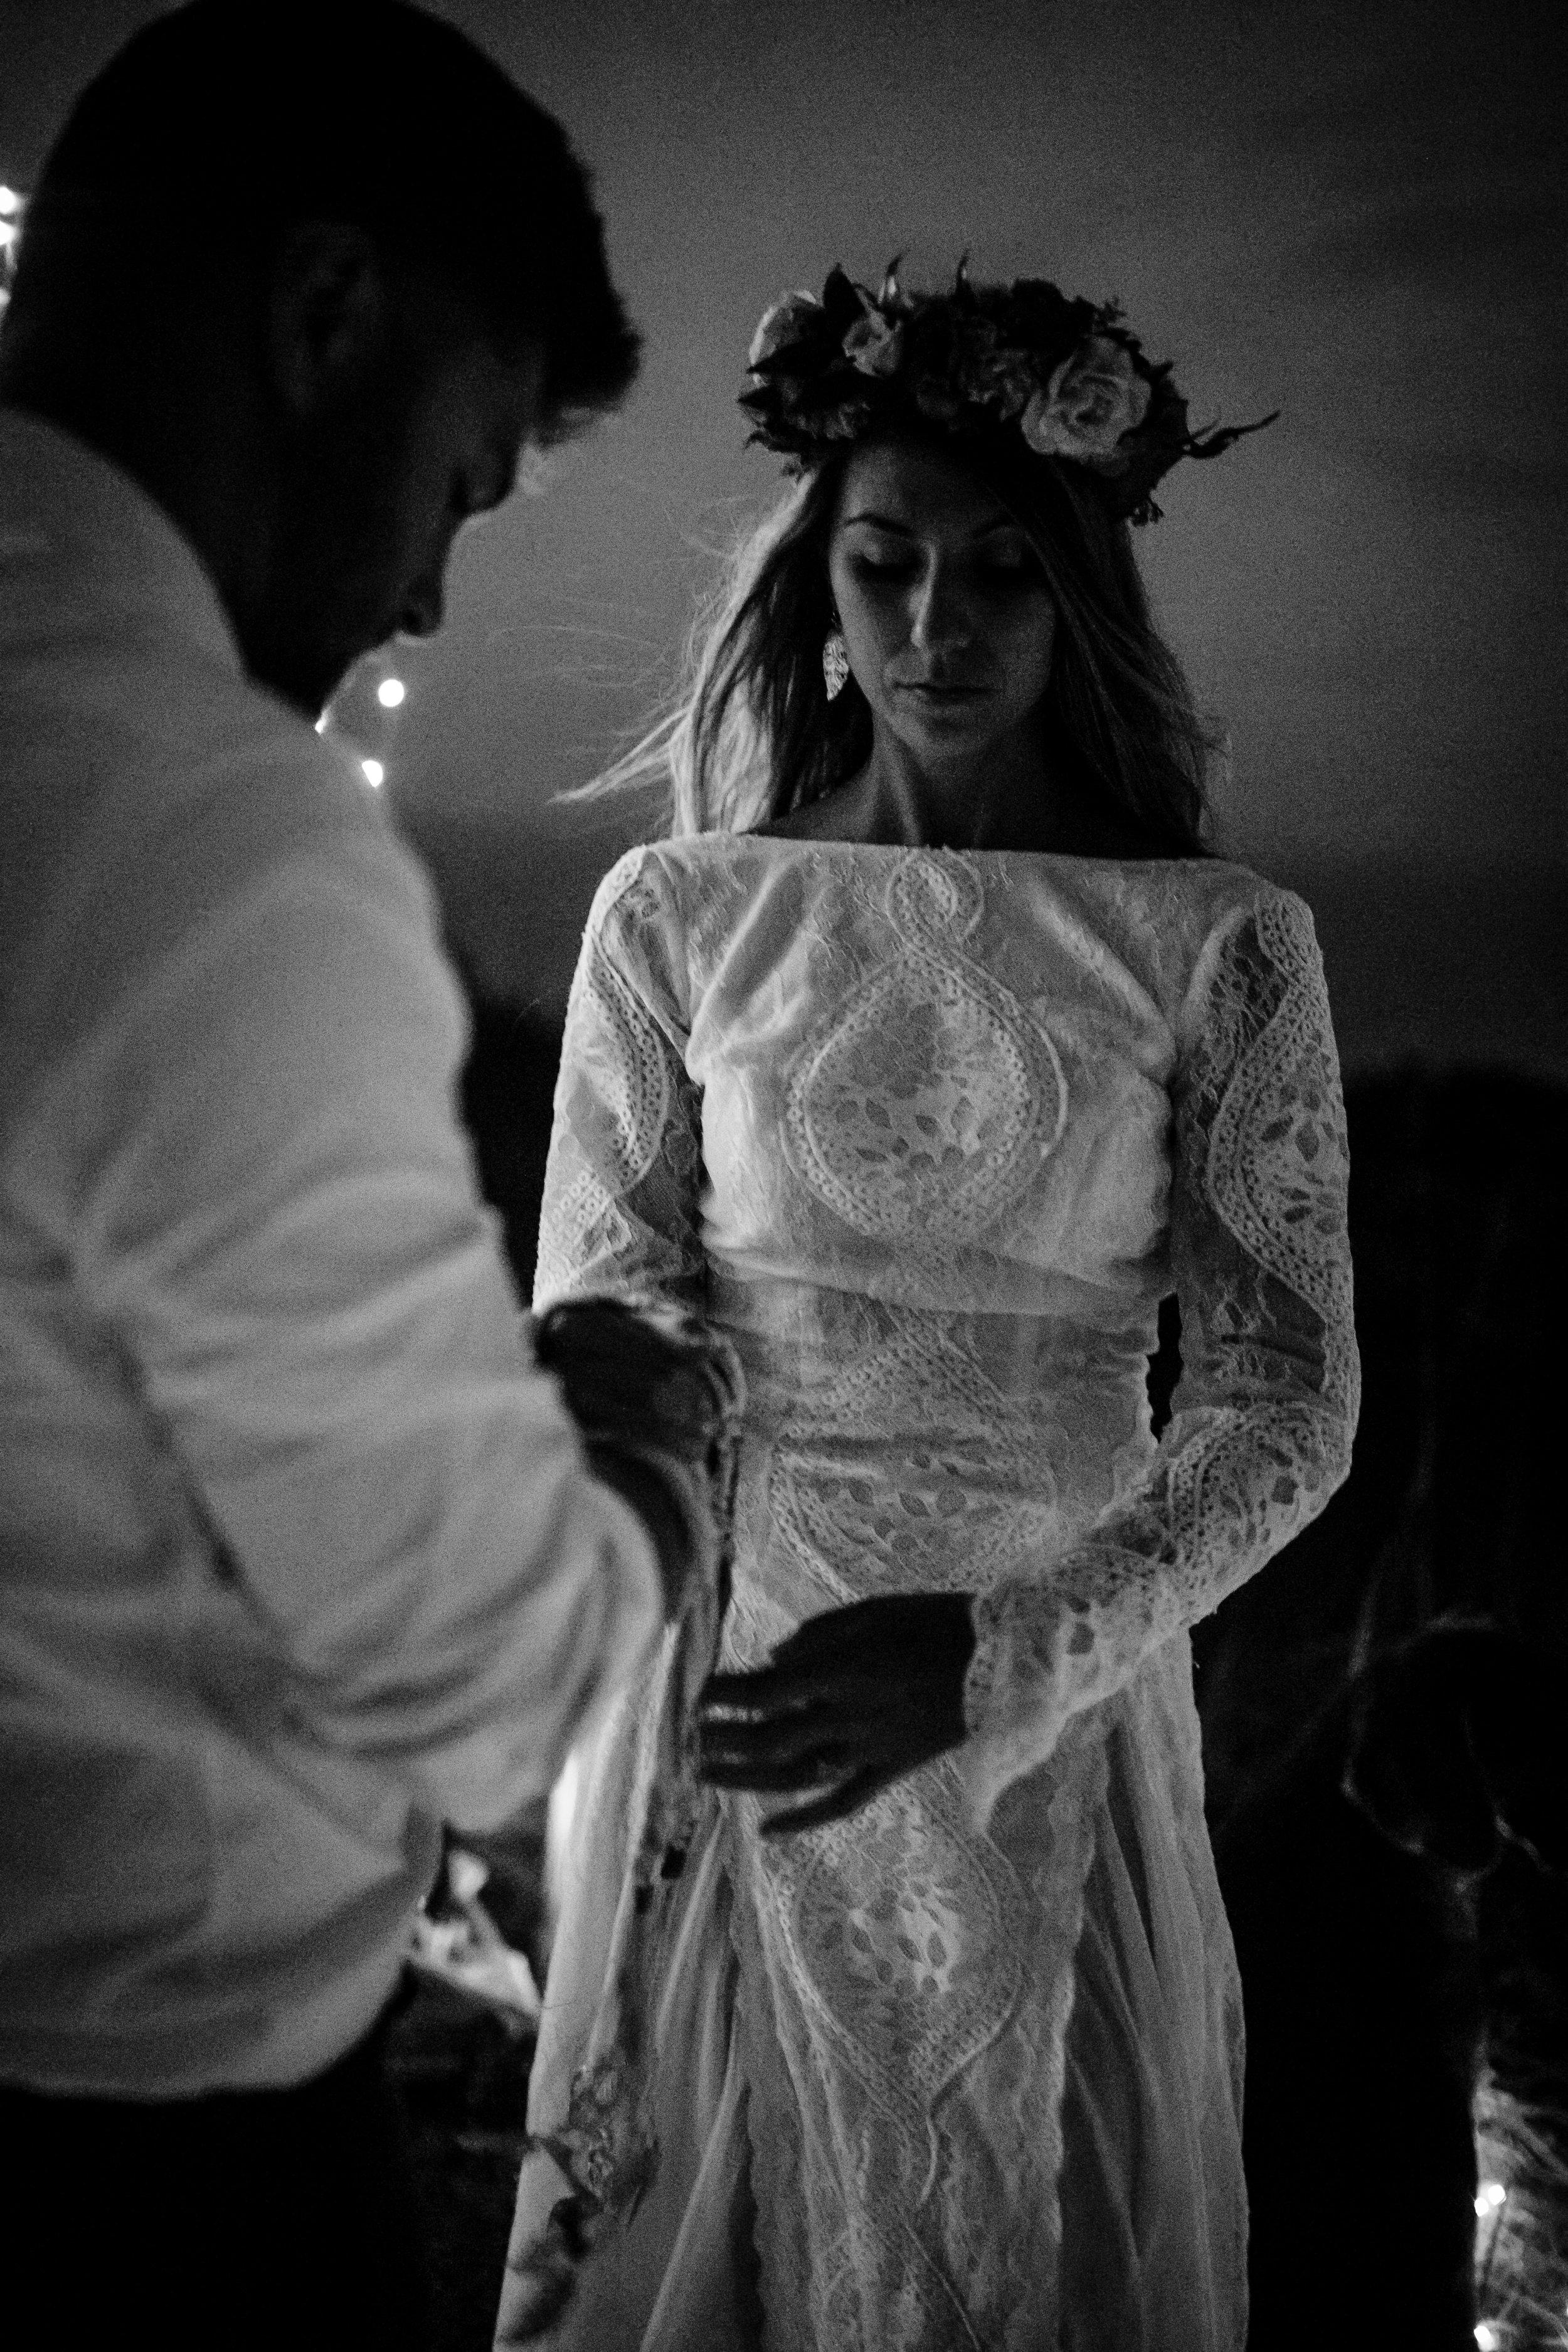 michigan-emotive-photographer-moonlight-elopement-mariha-hunter-300.jpg